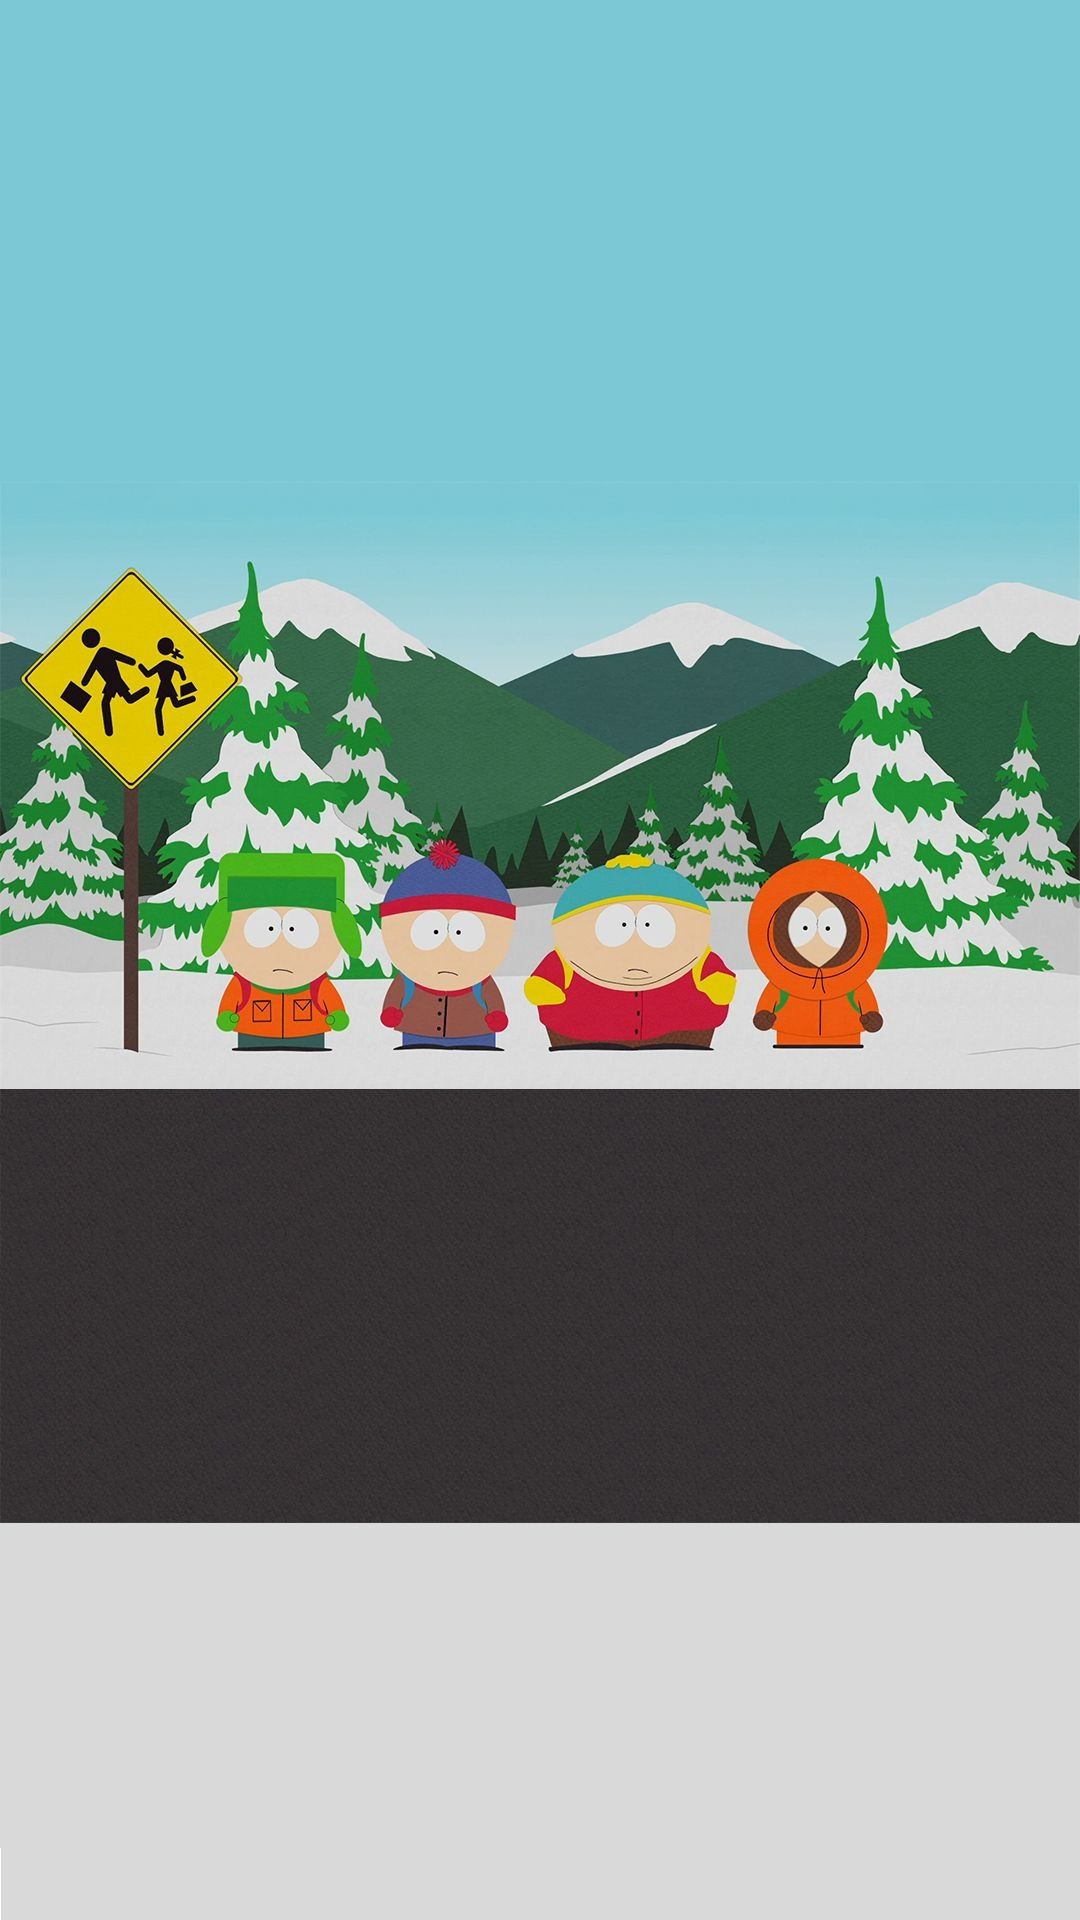 South Park Wallpaper Butters Stotch Hieifireblaze South in